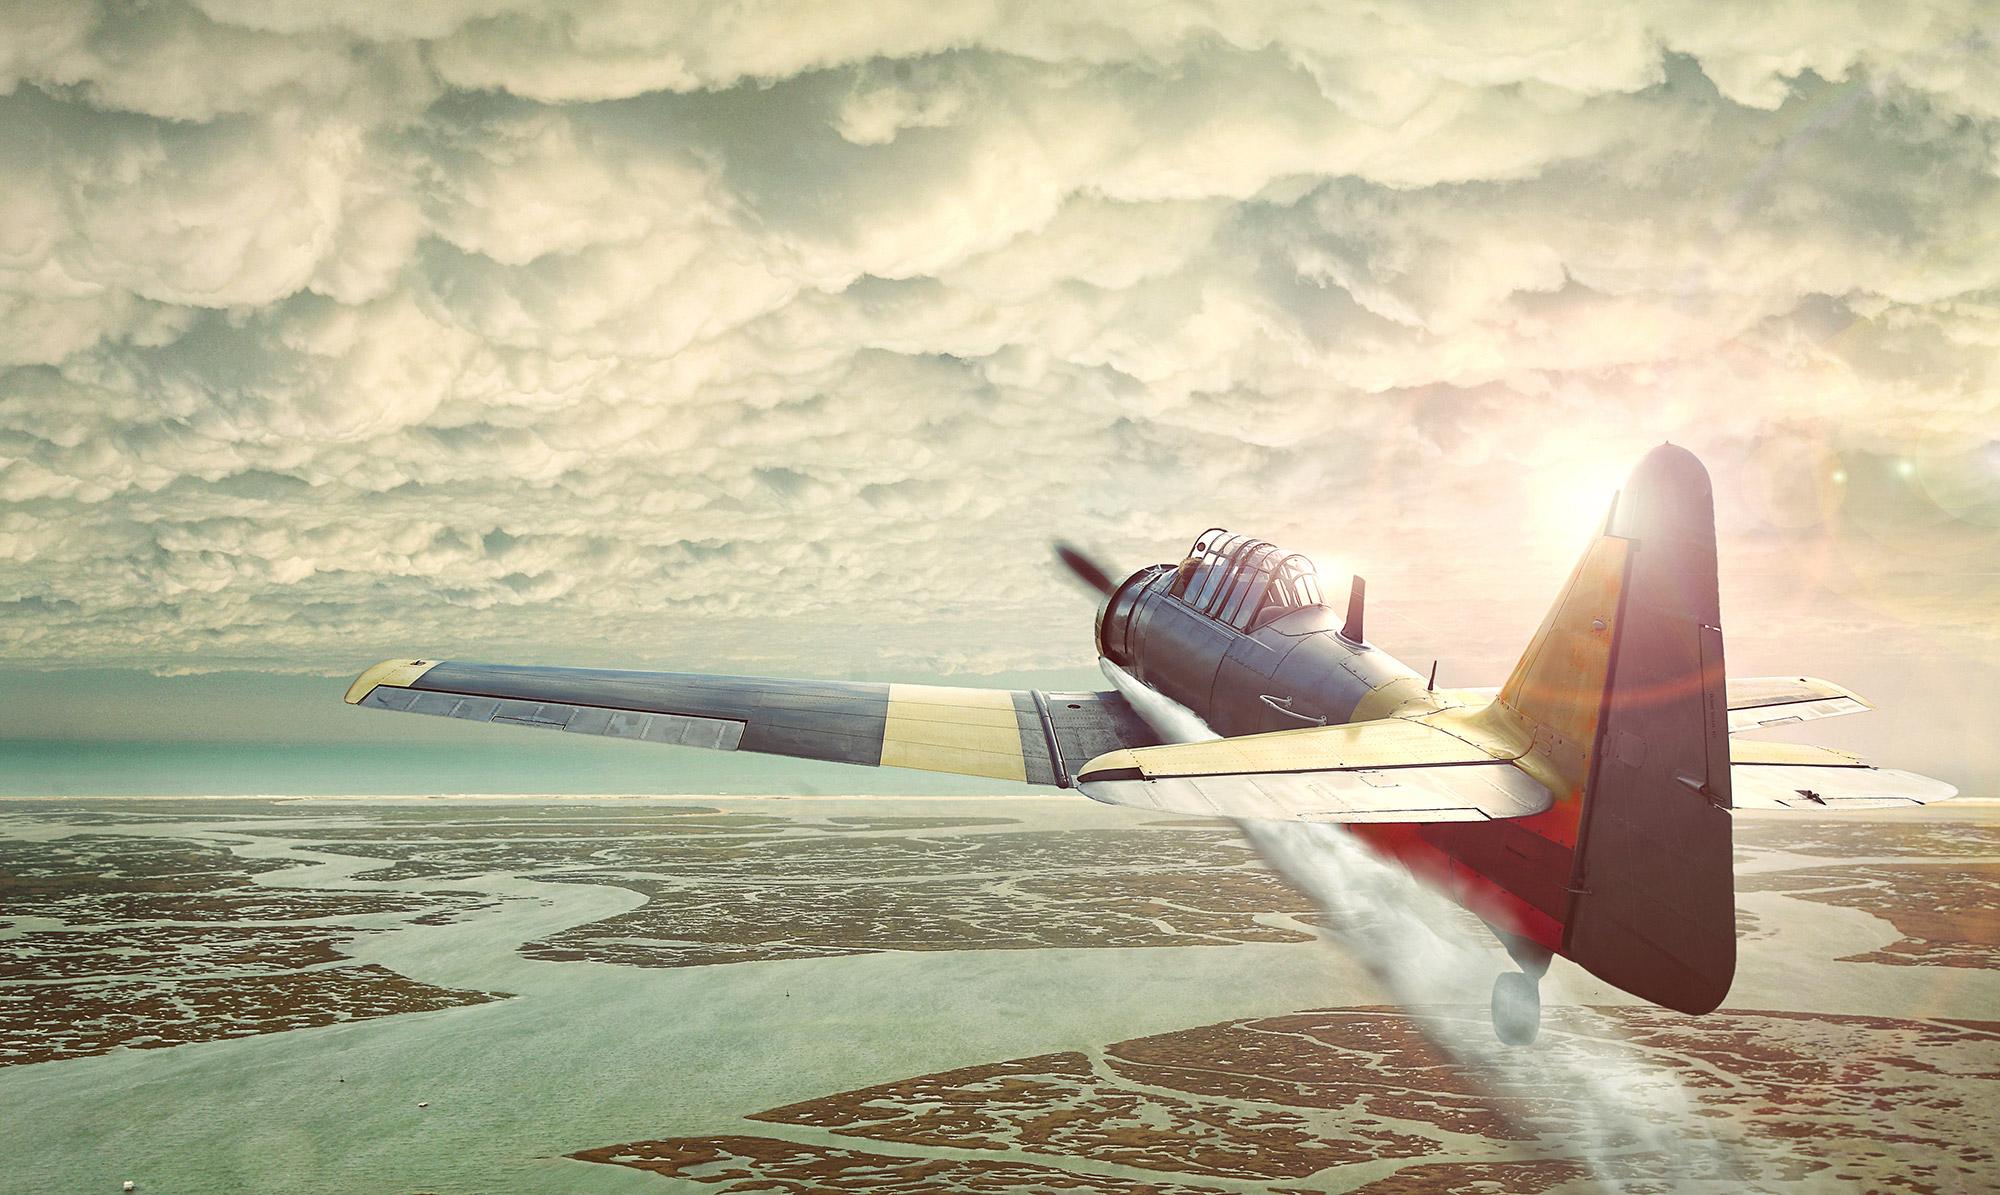 letadlo-ve-vzduchu